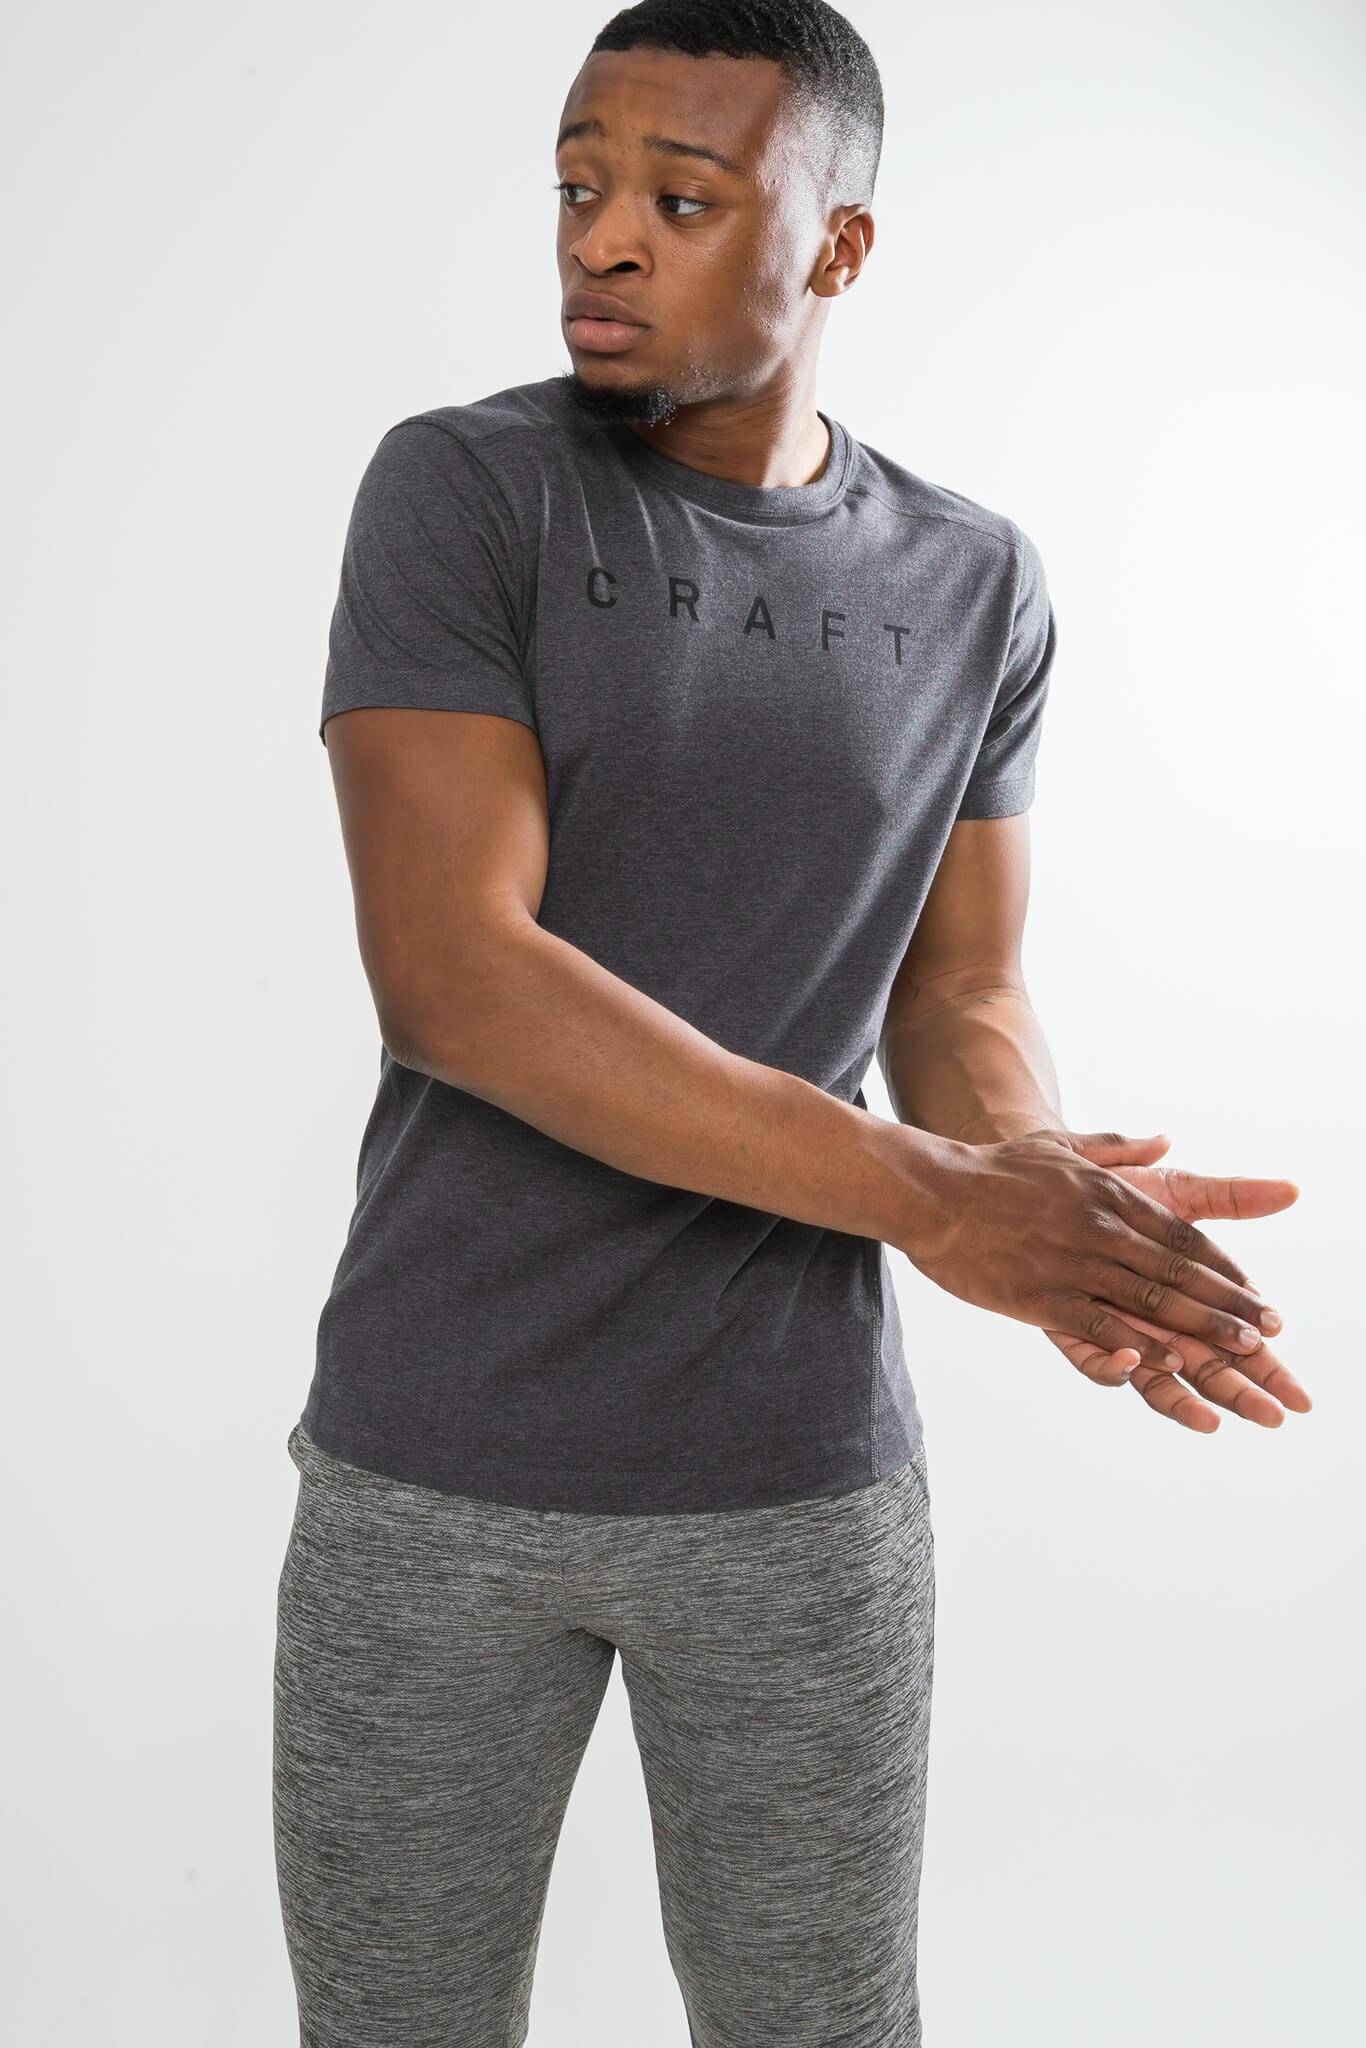 Craft Deft 2.0 футболка мужская dark grey - 2